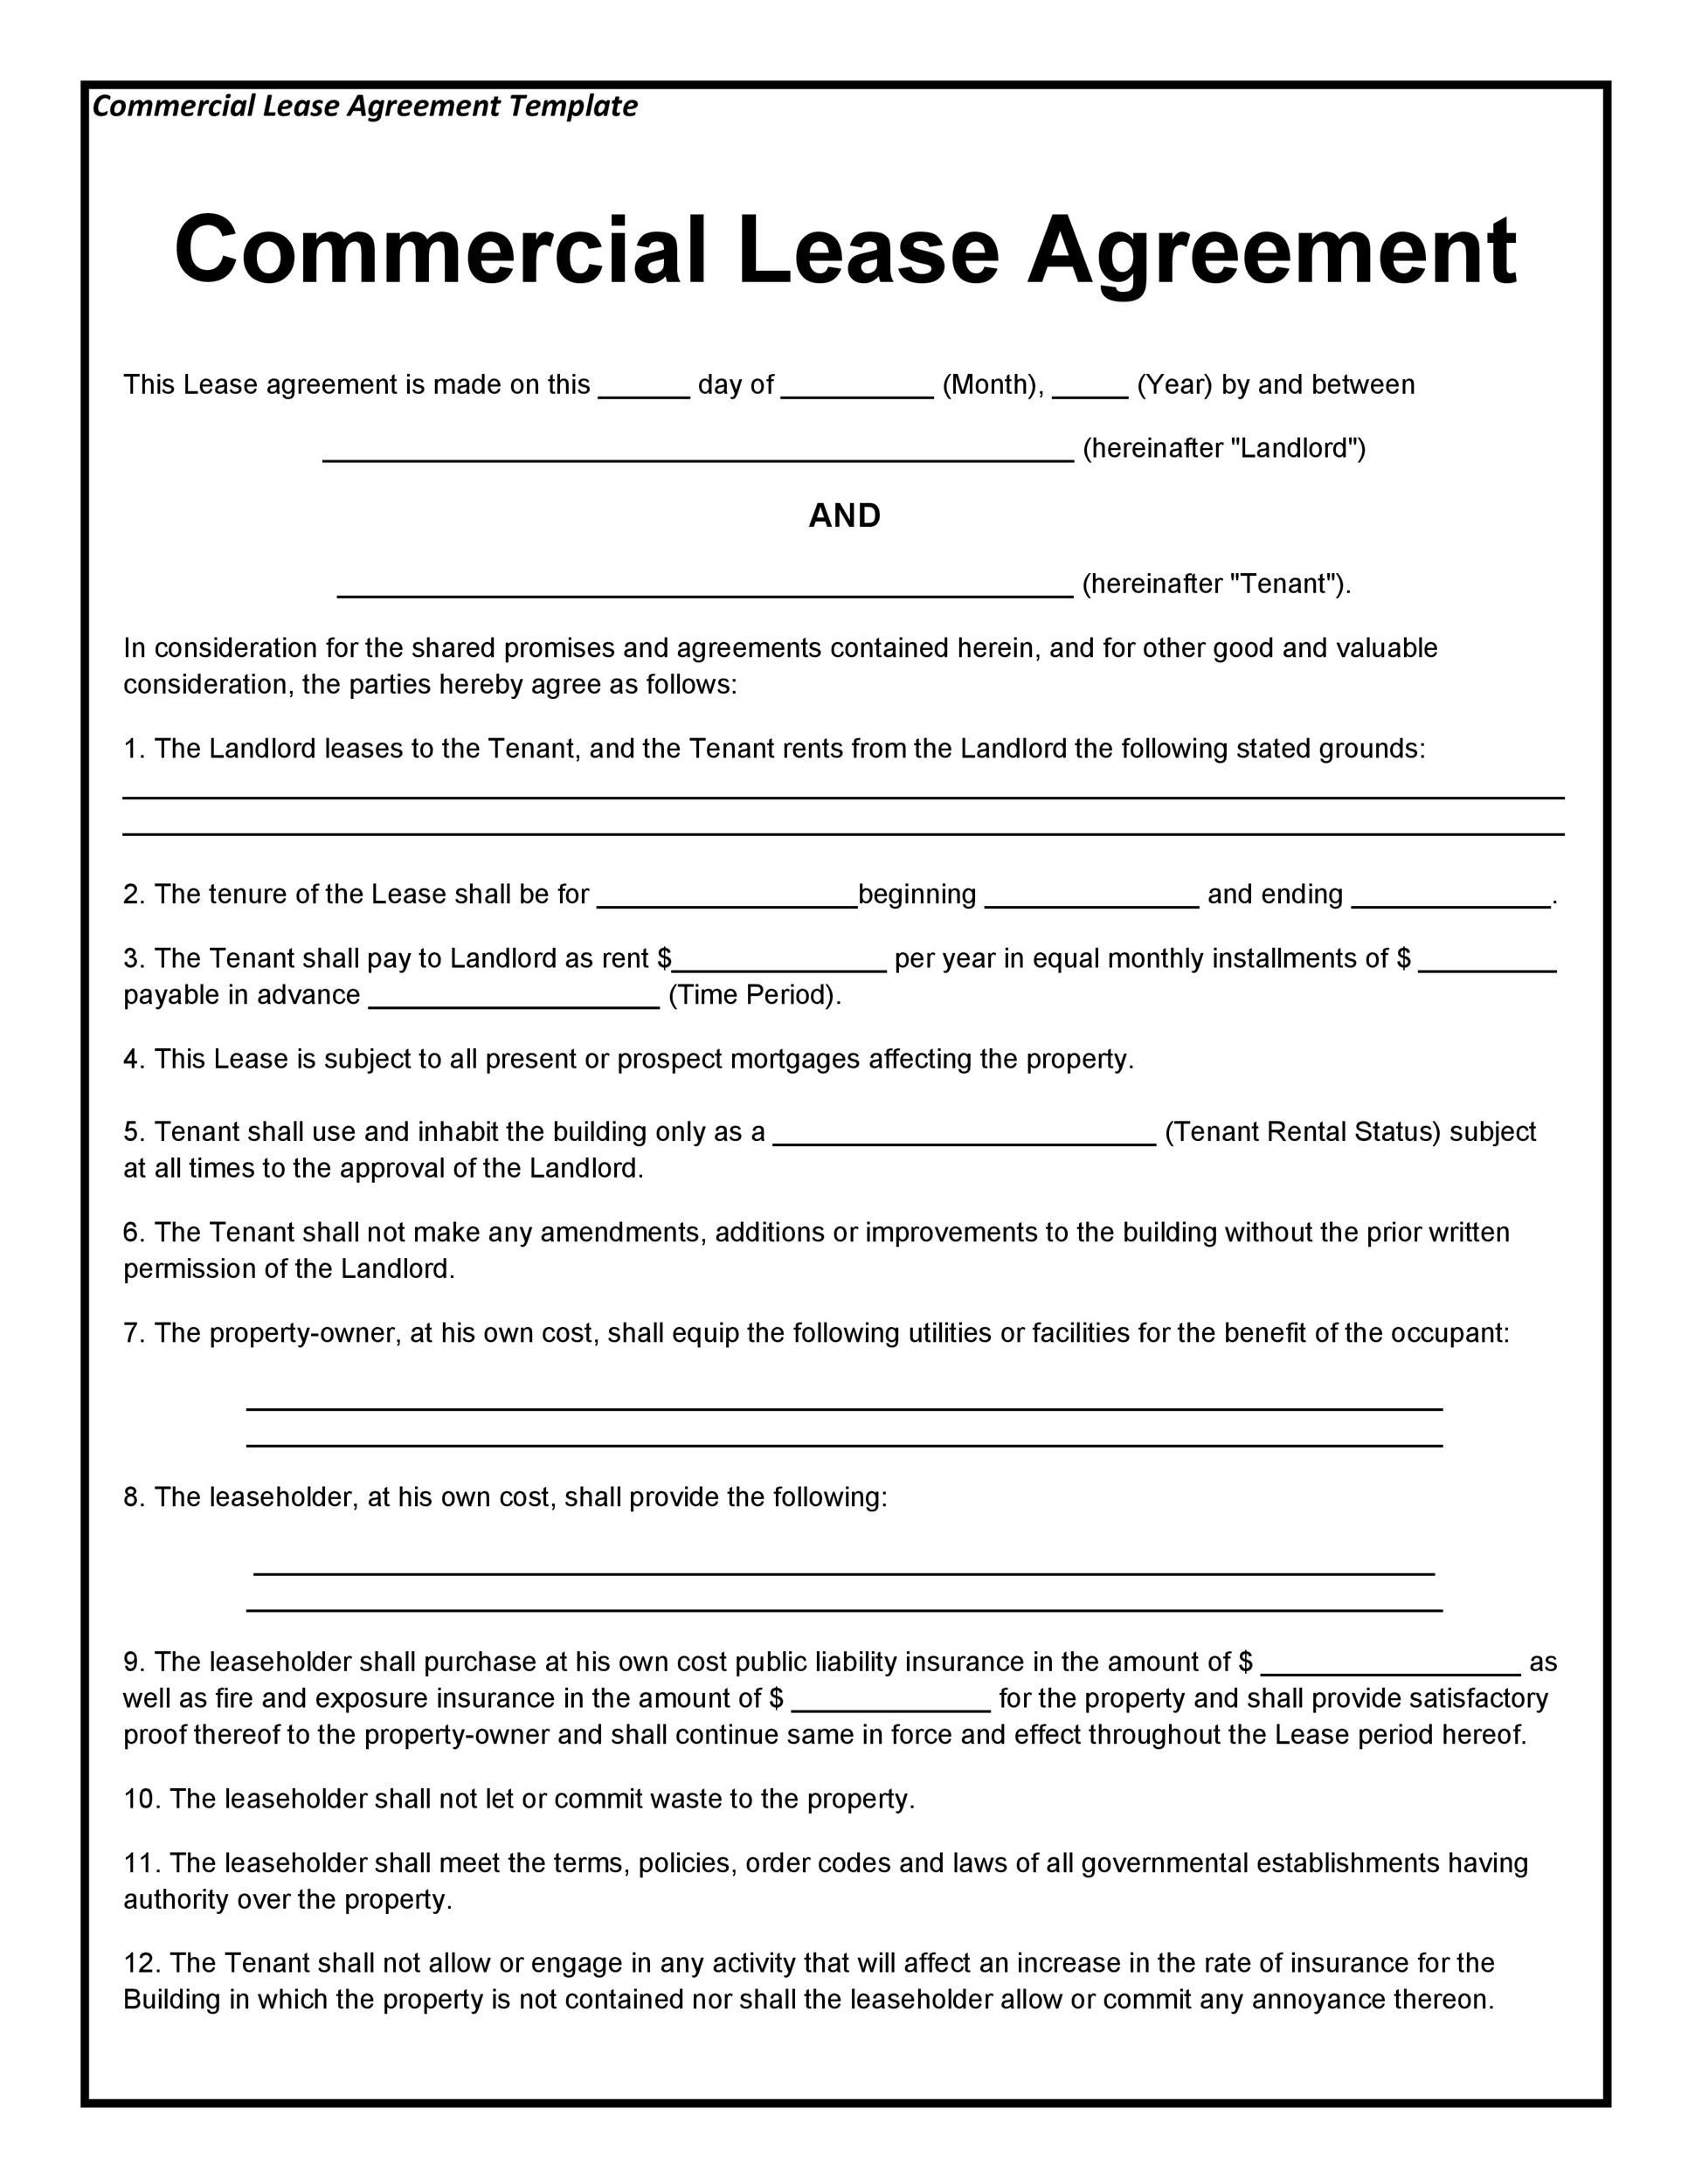 002 Striking Tenancy Agreement Template Word Free High Resolution  Uk 2020 Rental Doc LeaseFull